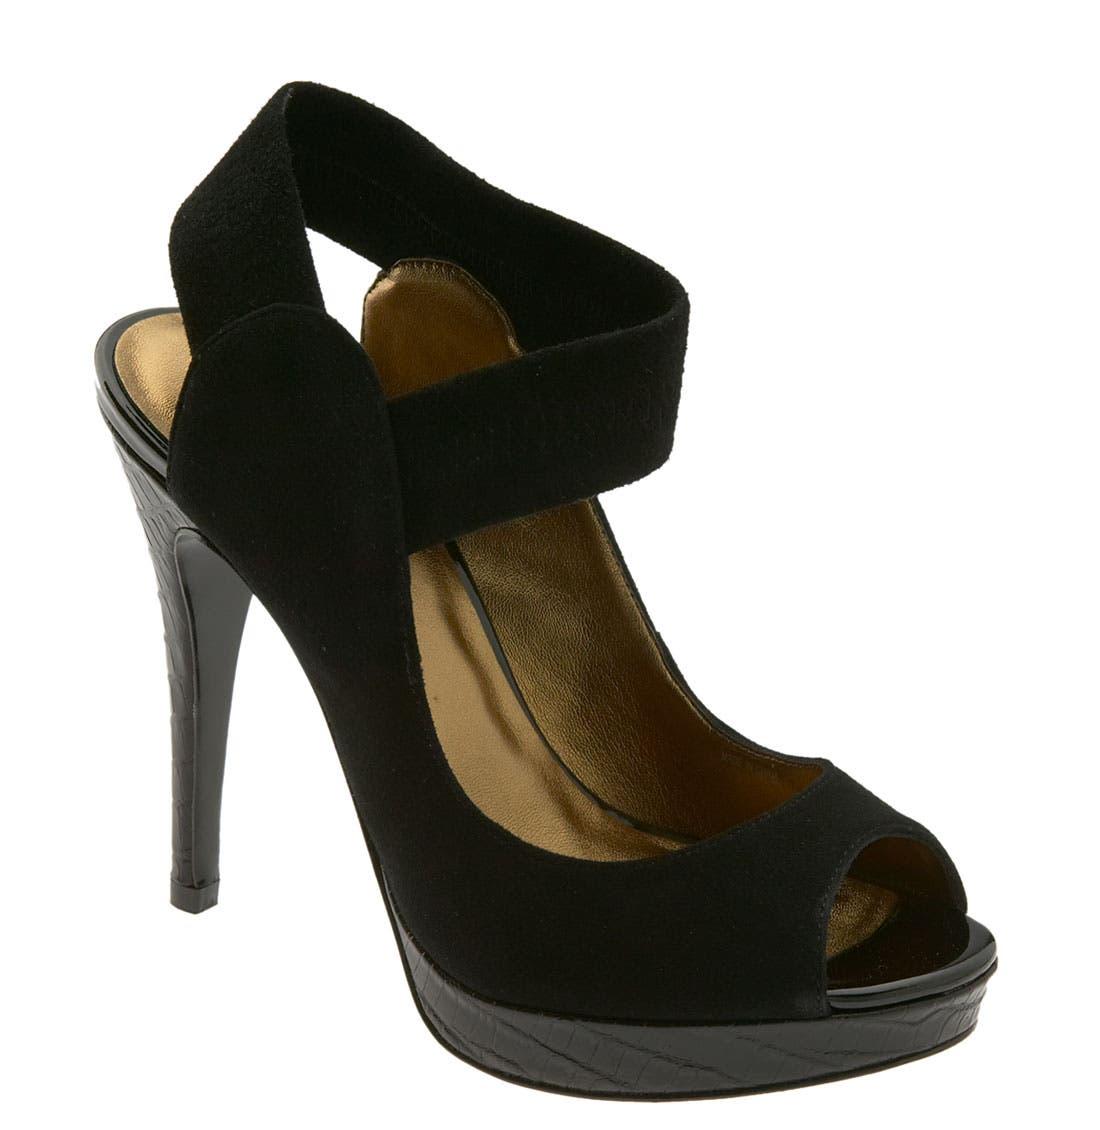 Main Image - Pelle Moda 'Issa' Platform Sandal